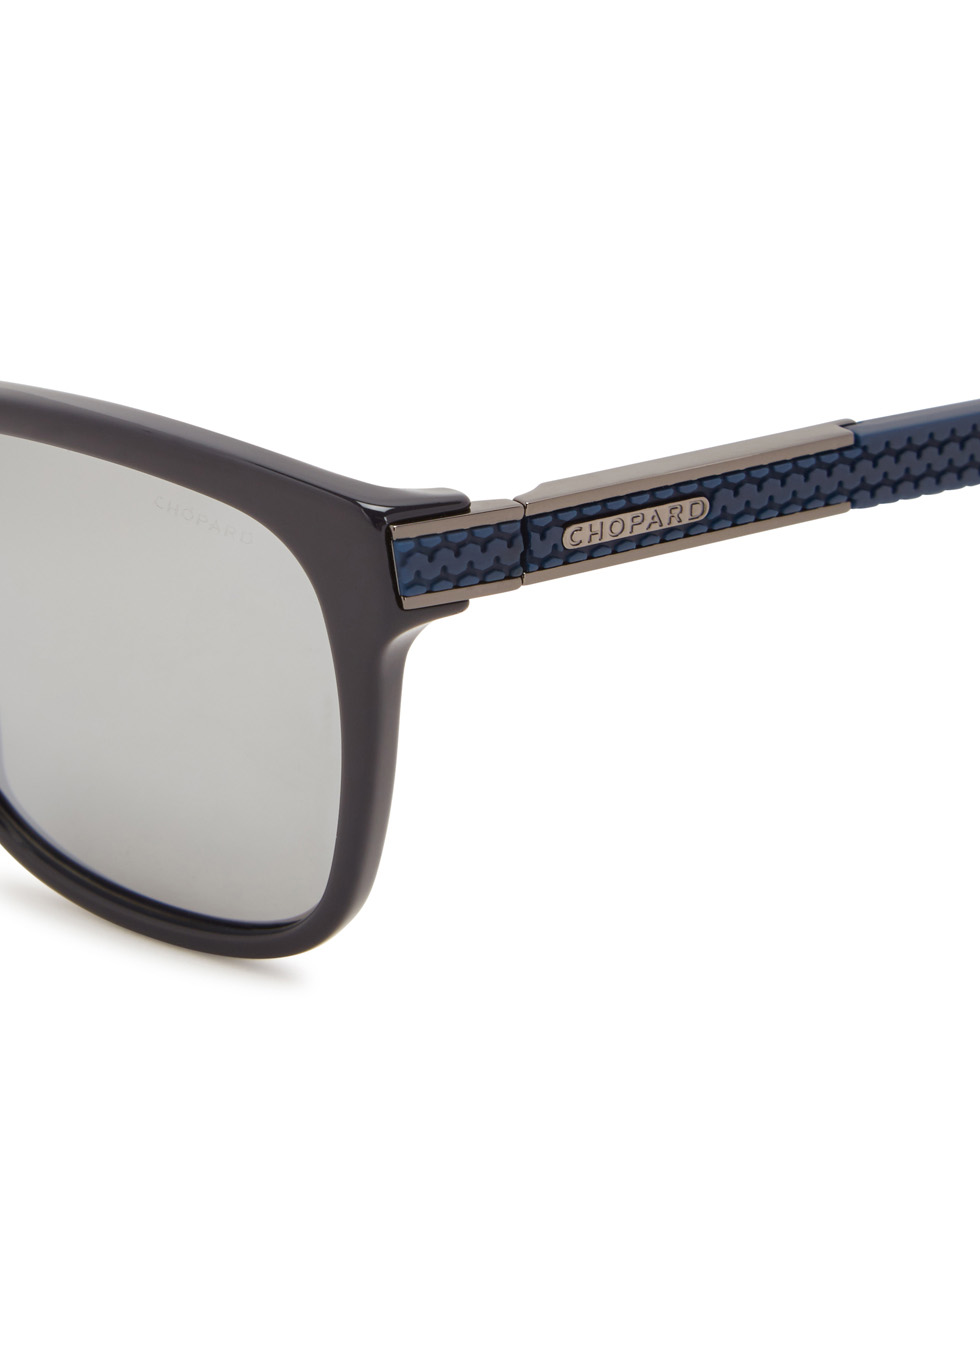 Navy polarised wayfarer-style sunglasses - Chopard